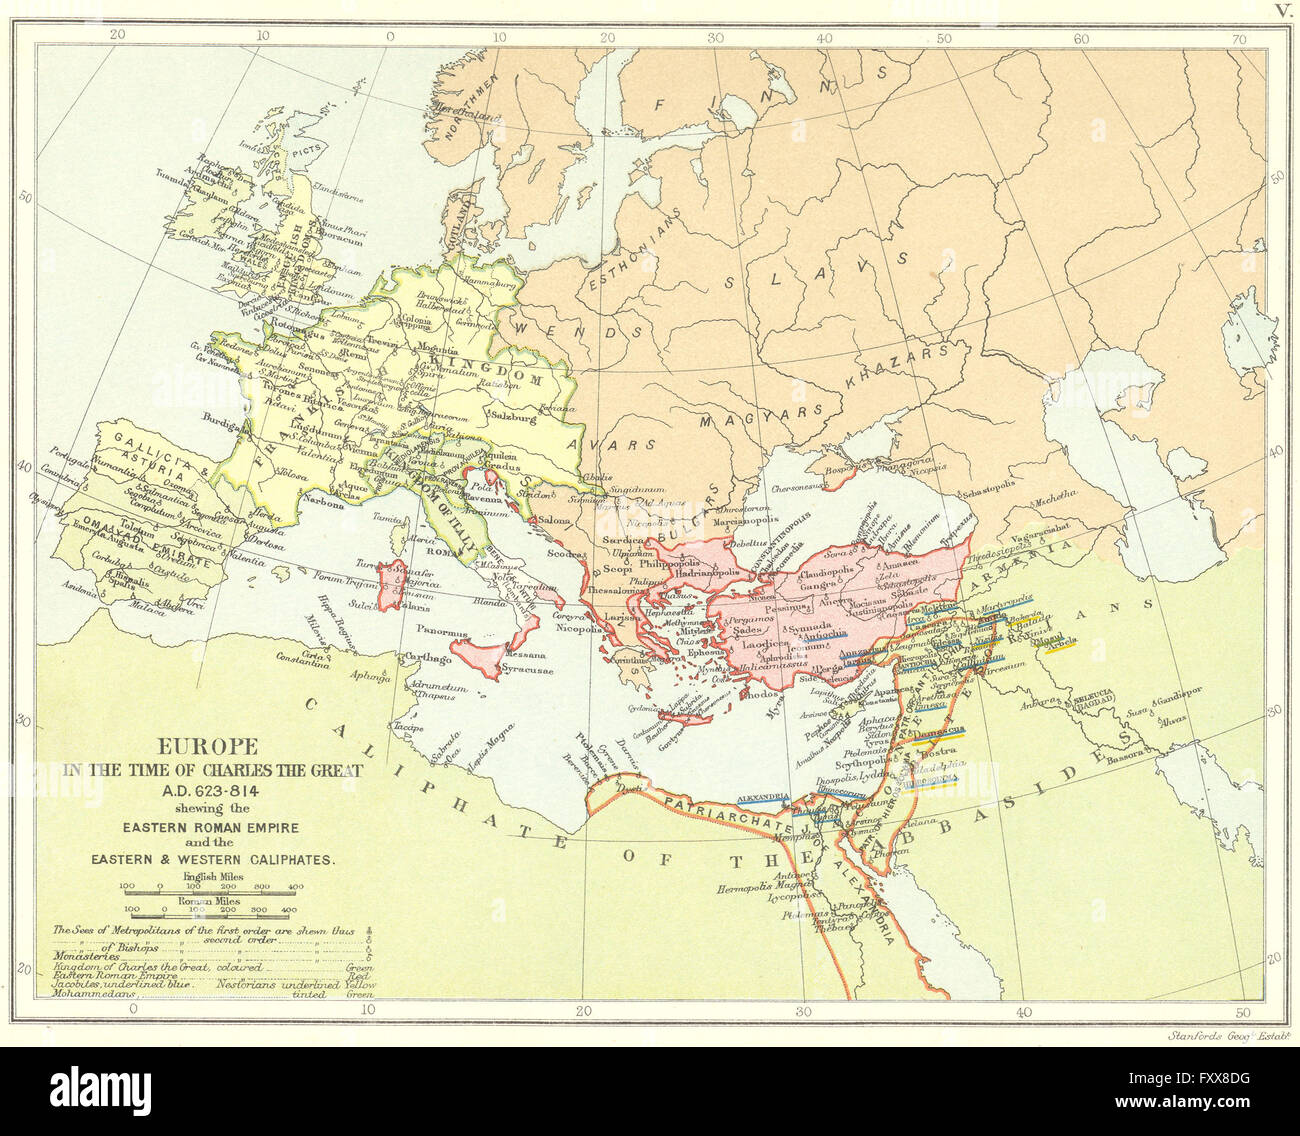 Europe 623 814ad Frankish Empire Eastern Roman Empire Caliphates